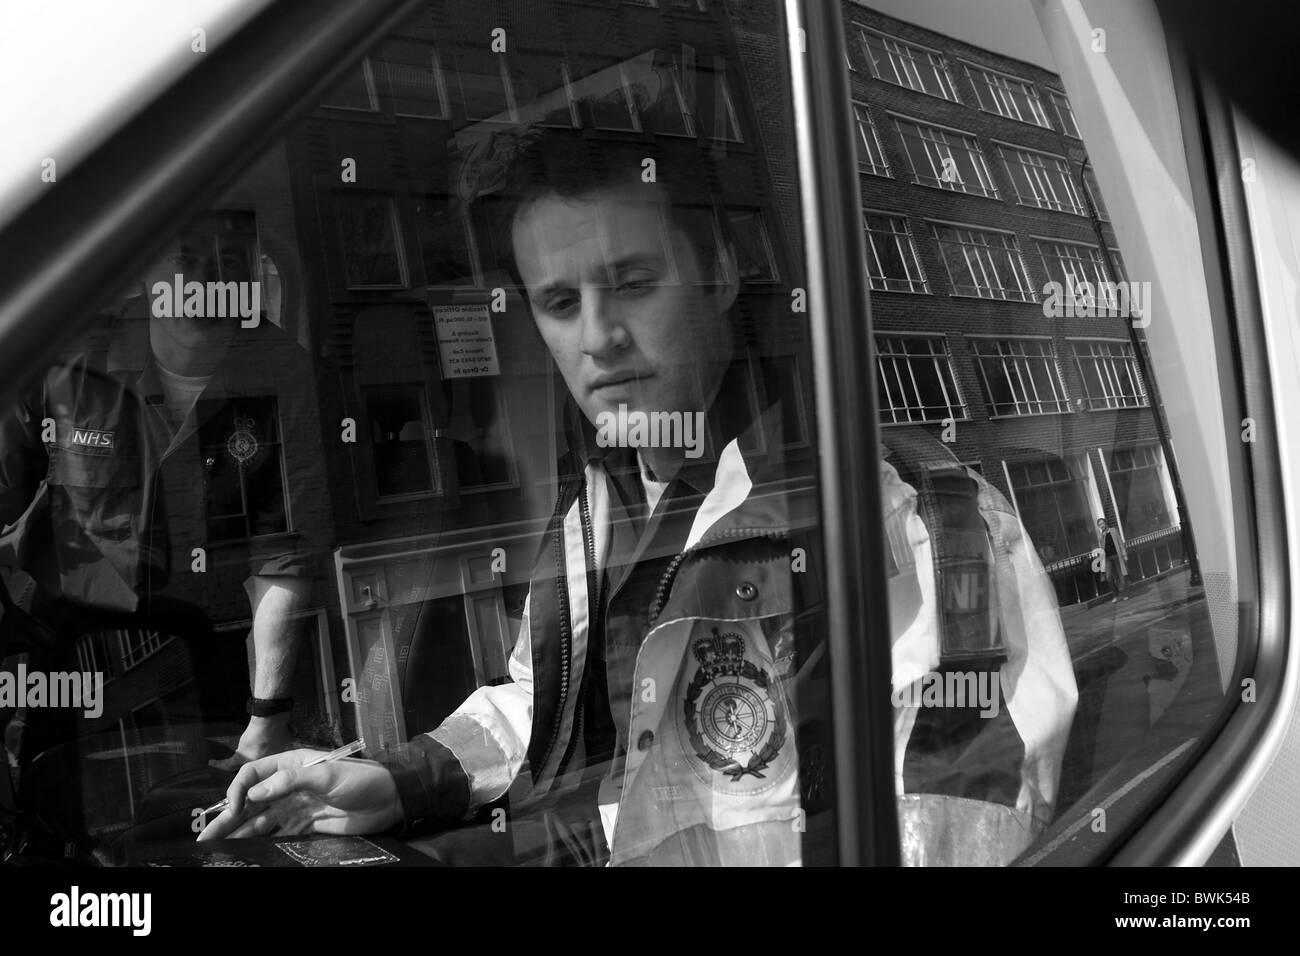 United Kingdom, London Ambulance Service.  A paramedic looks out of the ambulance window. - Stock Image